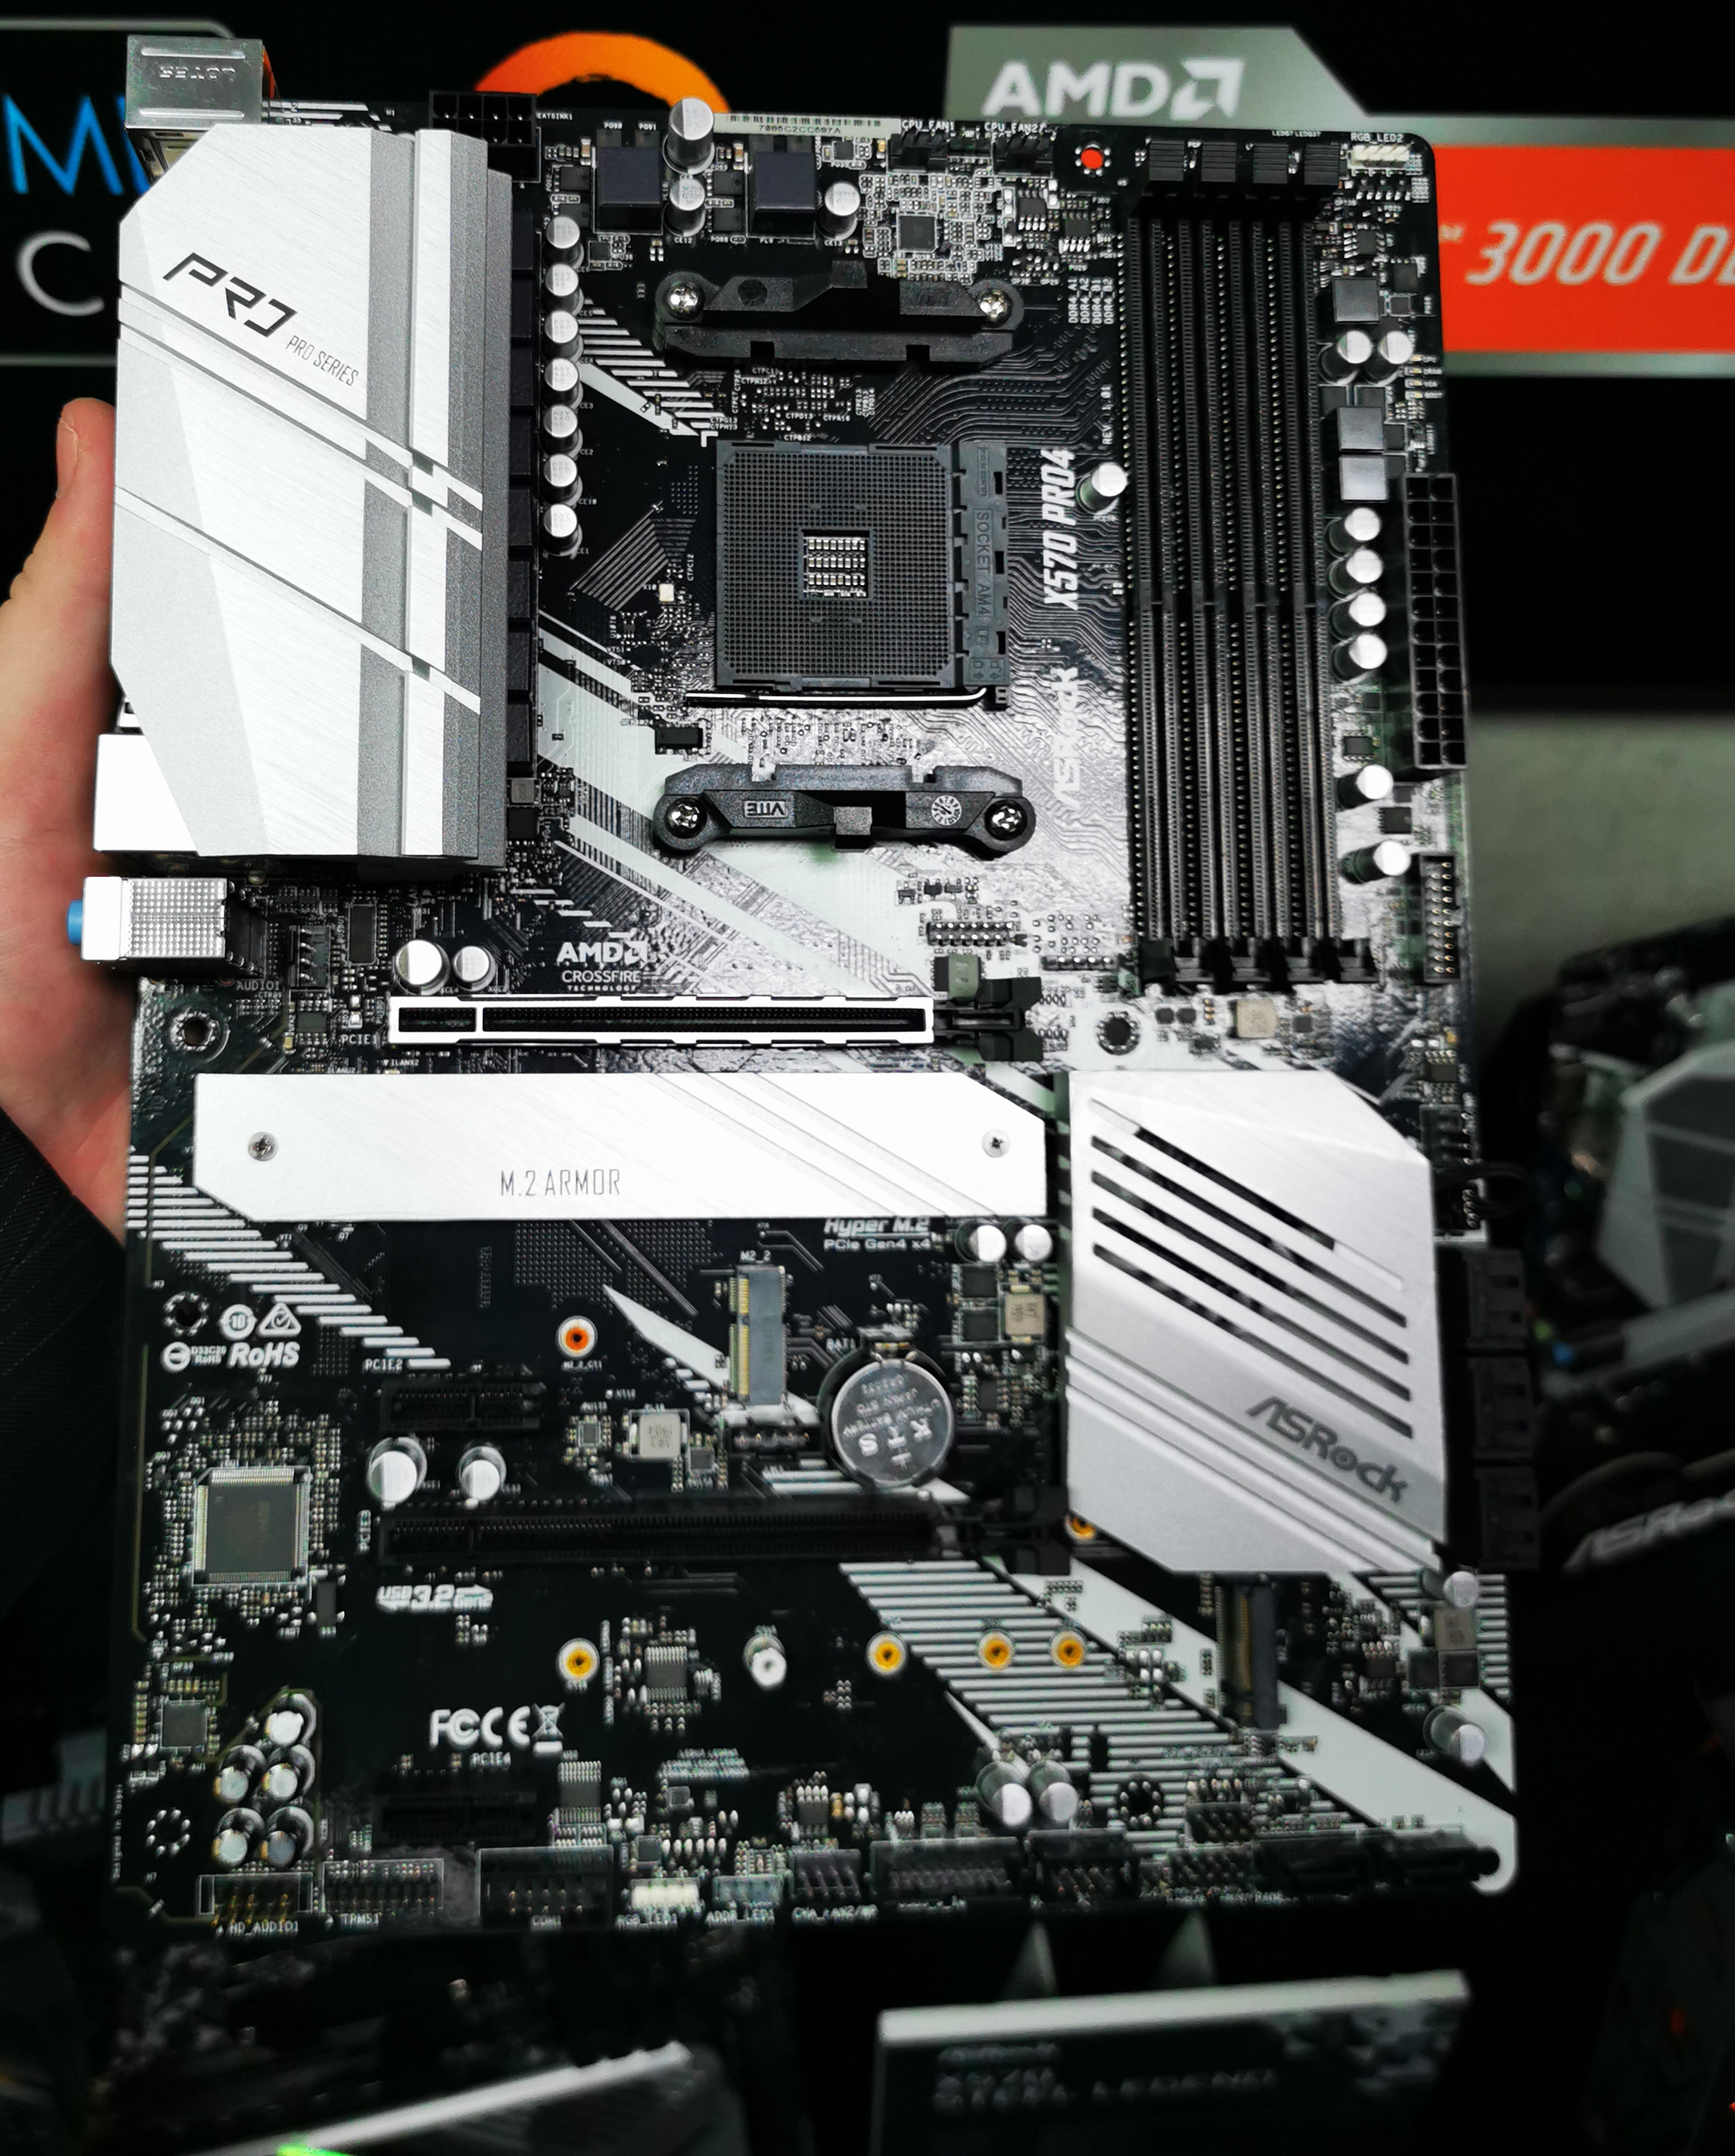 ASRock X570 Pro4 & X570M Pro4 - The AMD X570 Motherboard